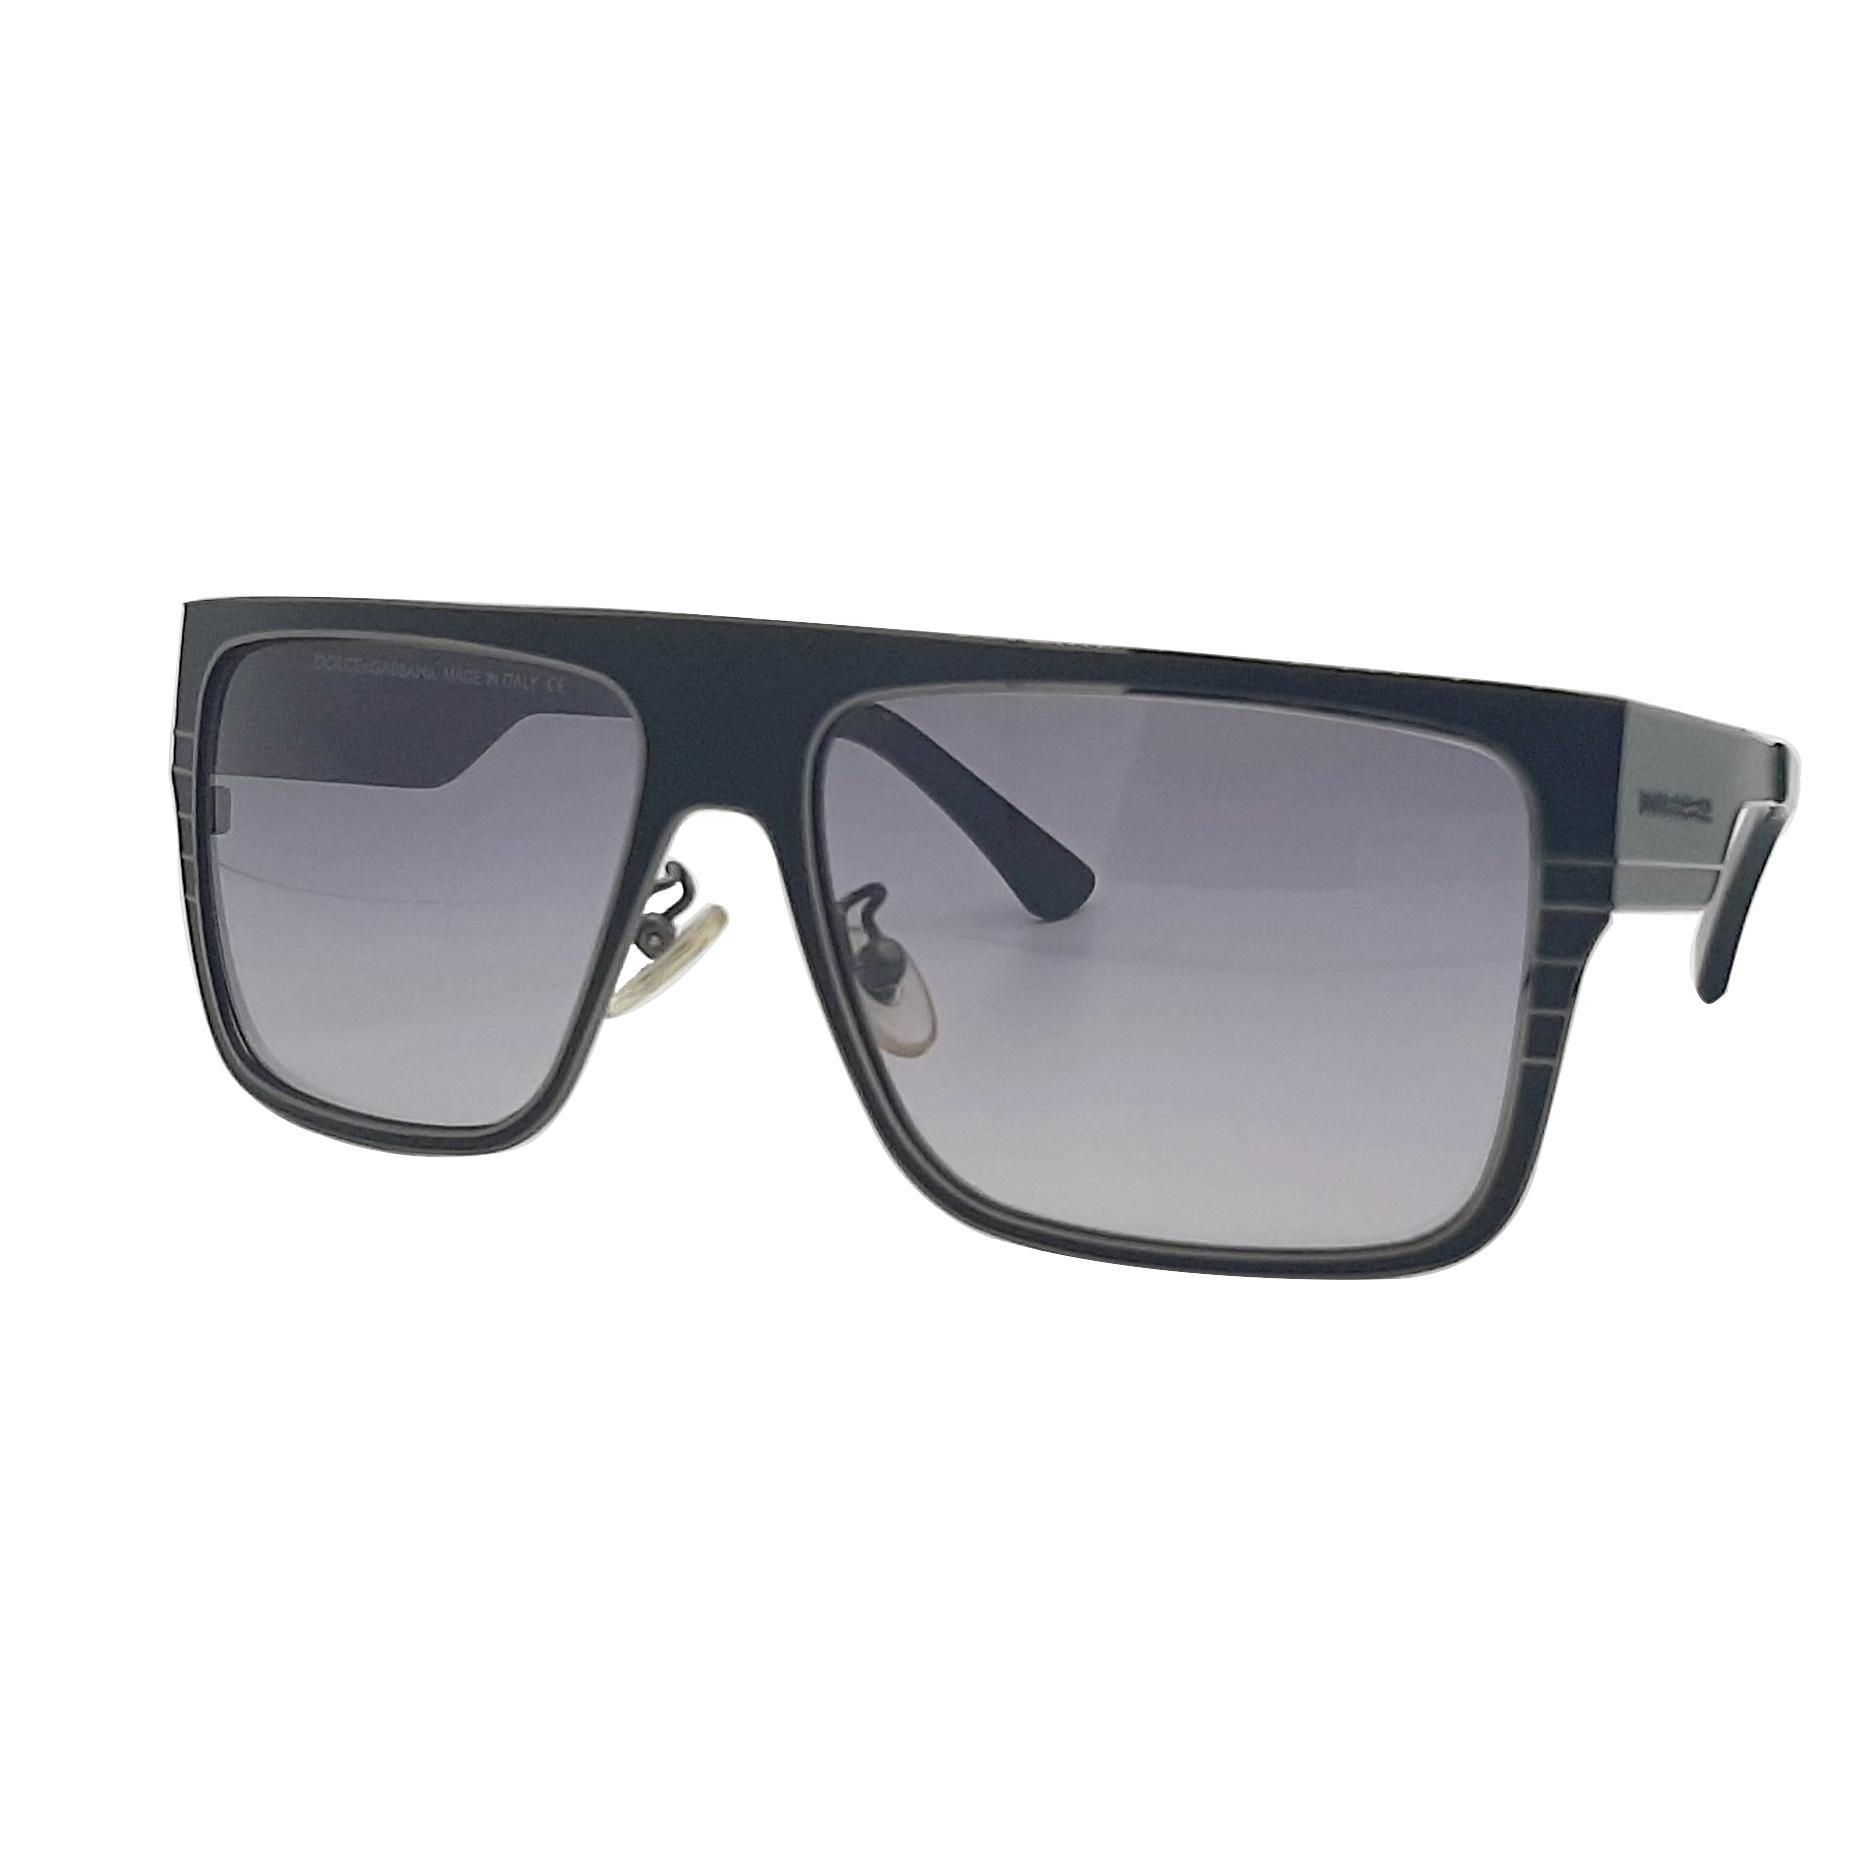 عینک آفتابی دولچه اند گابانا مدل DG6150